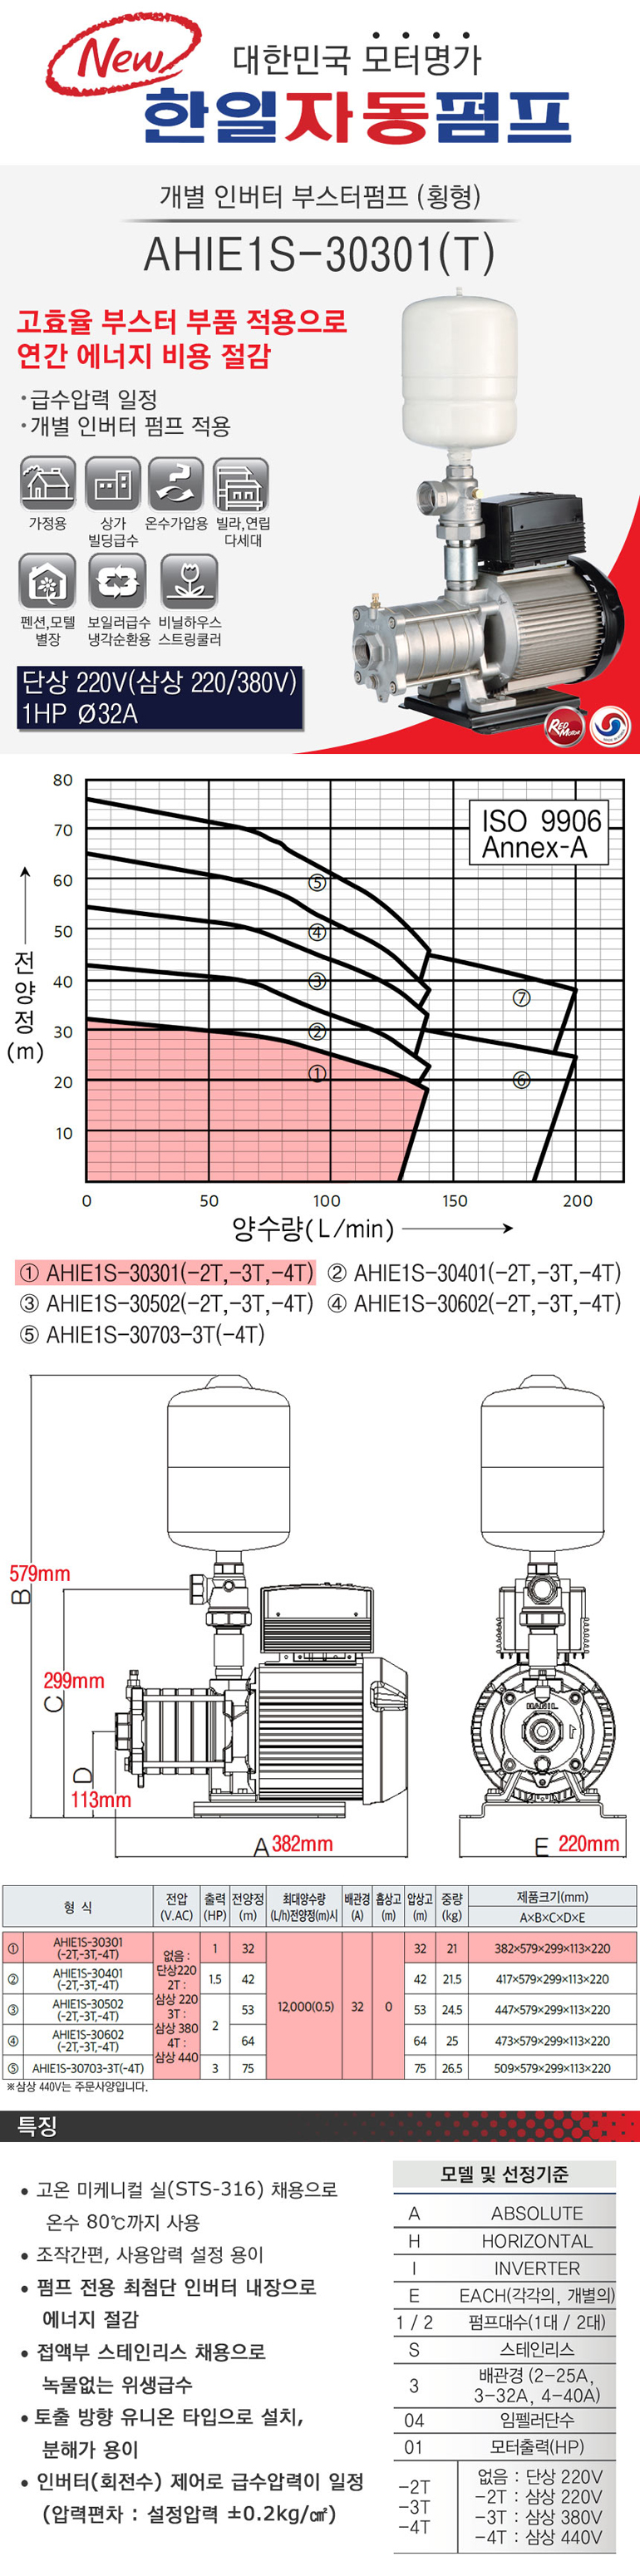 AHIE1S-30301